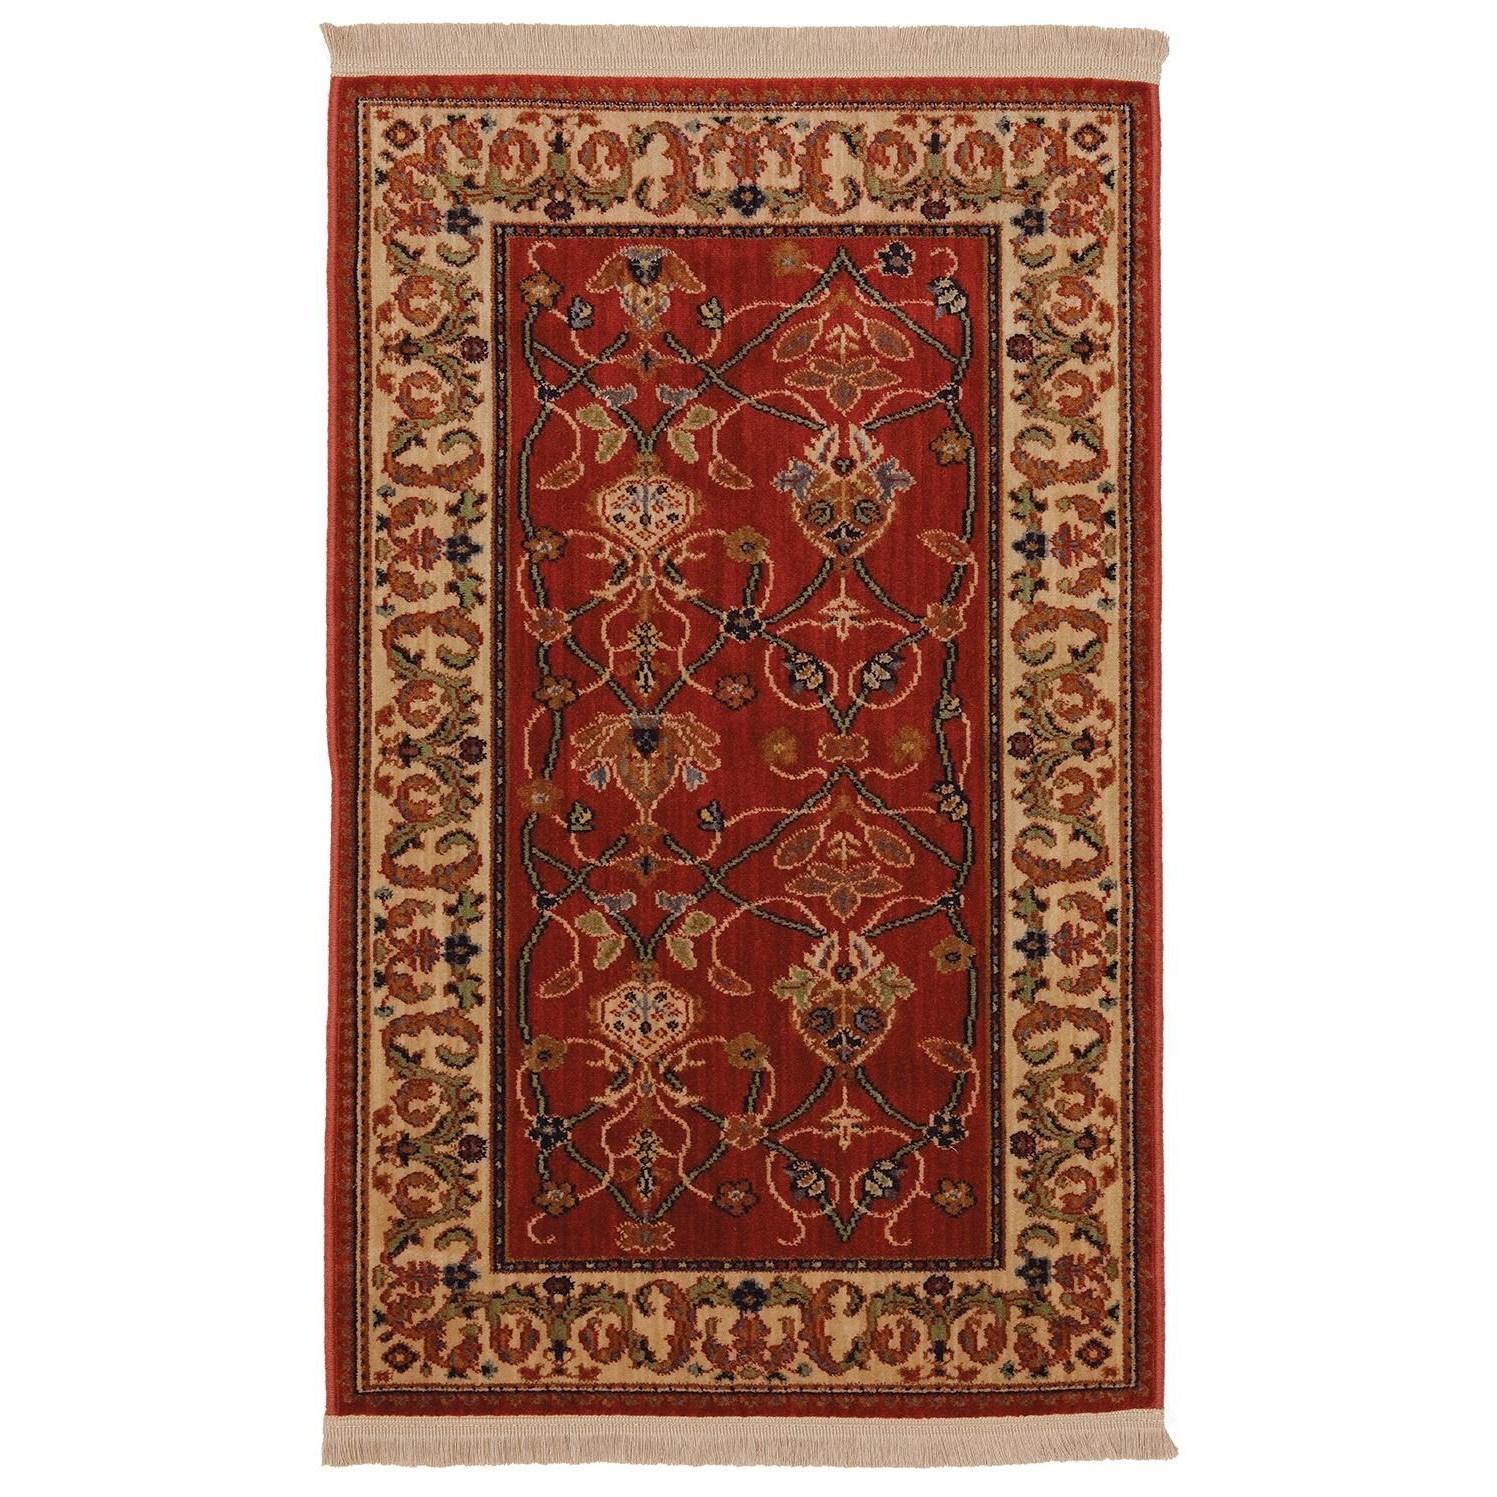 Karastan Rugs English Manor 8'6x11'6 William Morris Red Rug - Item Number: 02120 00510 102138